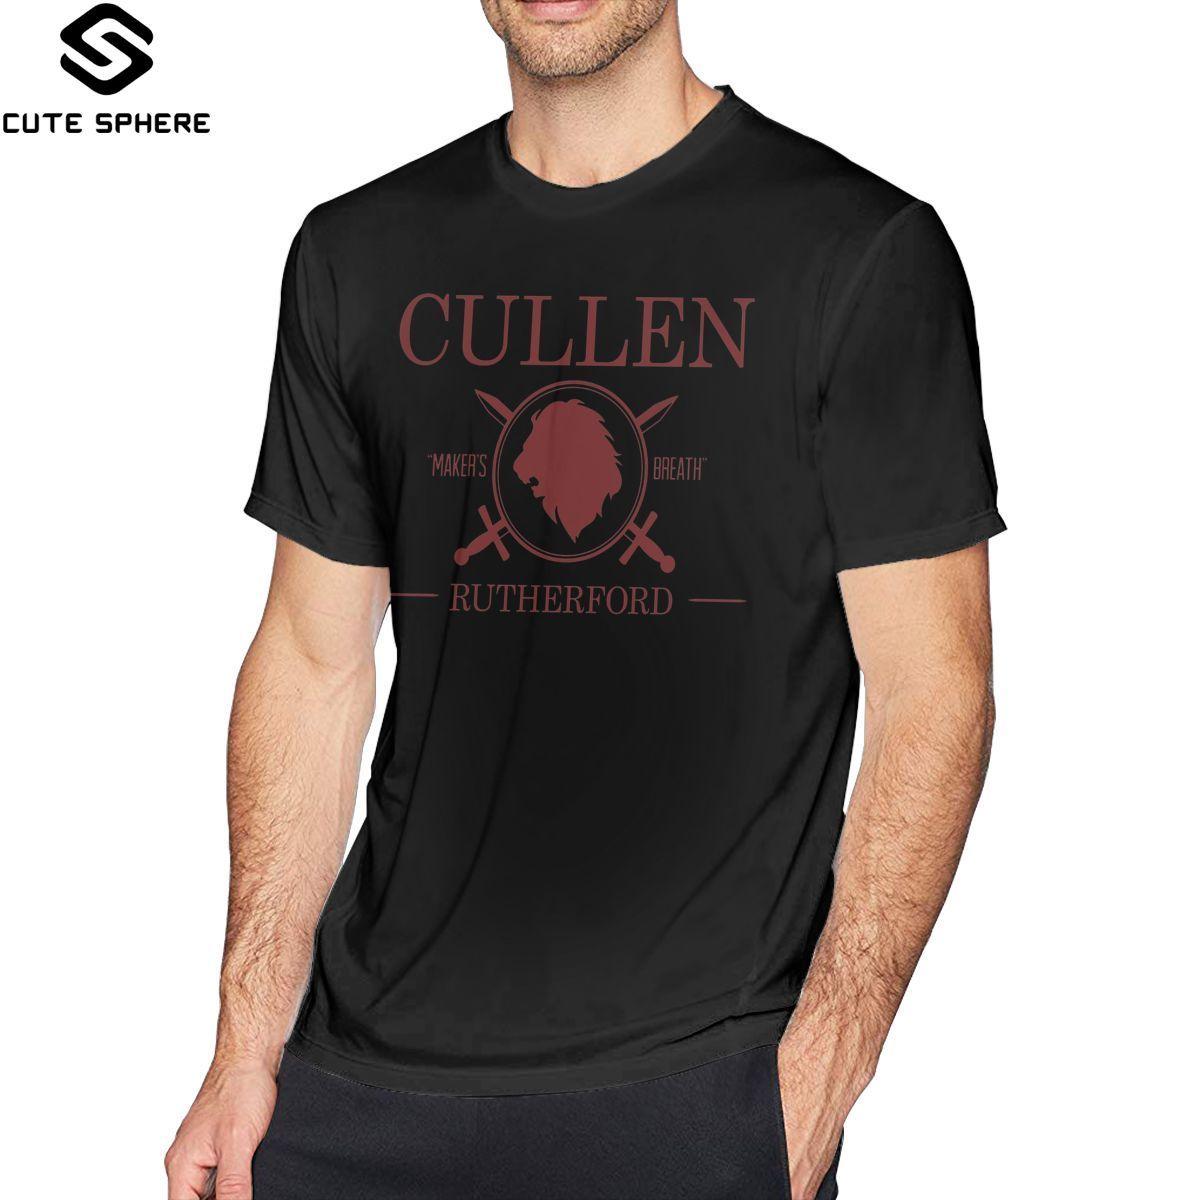 Dragon Age Inquisition T Shirt Dragon Age Cullen T-Shirt komik kısa kollu Tee gömlek baskılı rahat gömlek